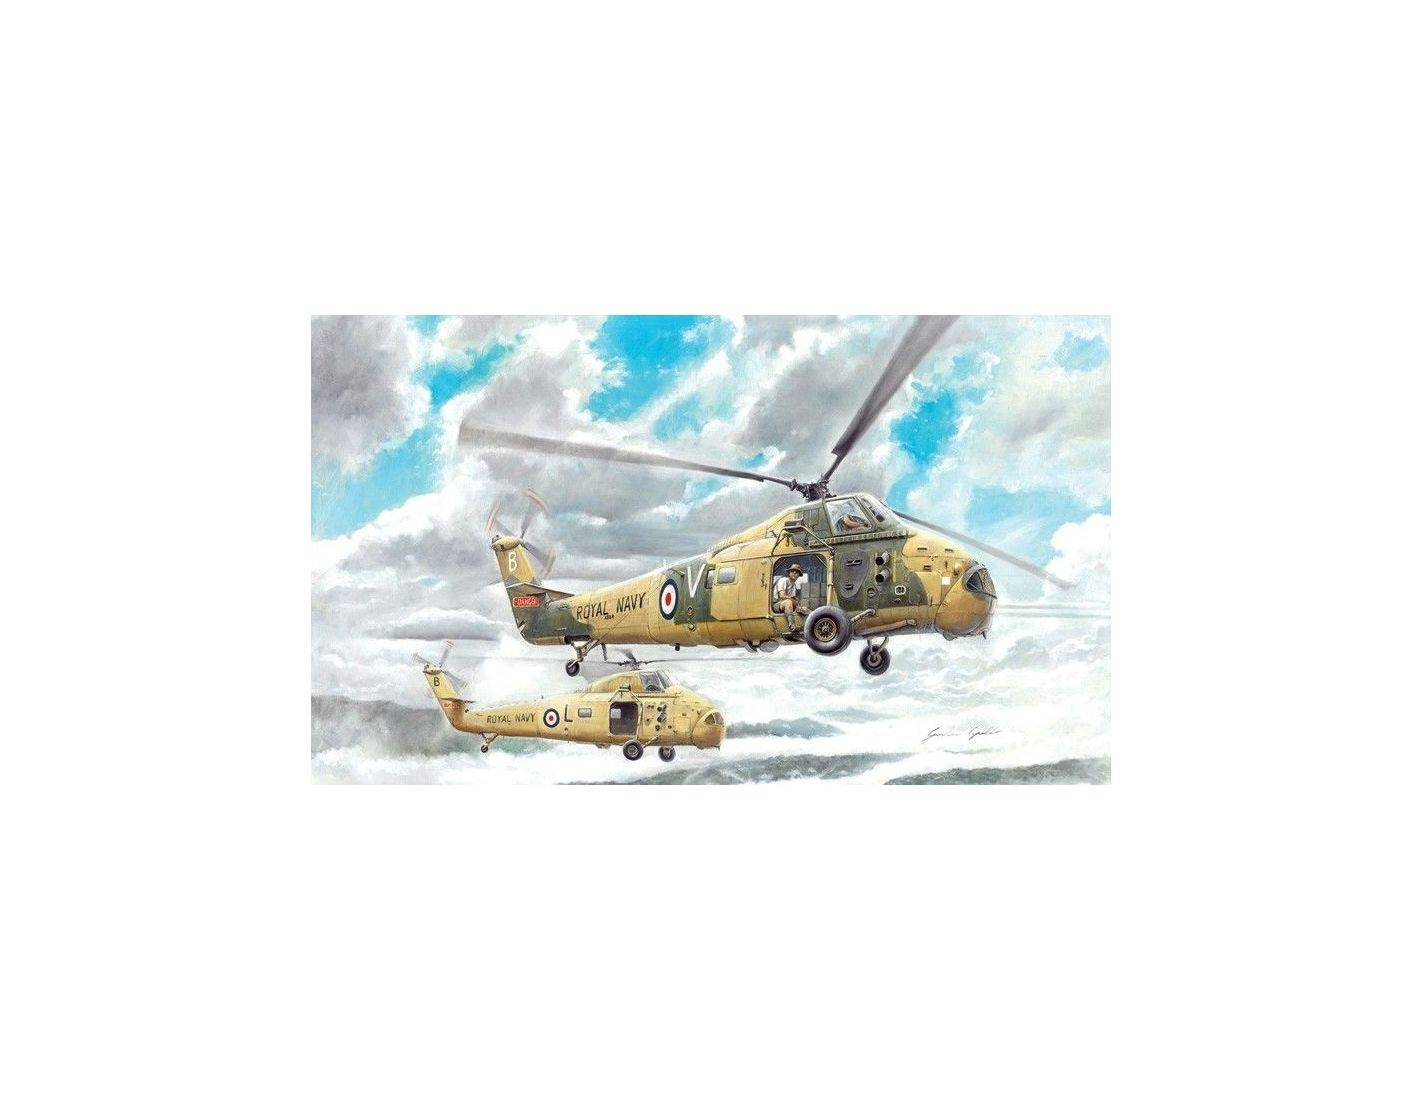 Elicottero Wessex : Italeri it elicottero wessex has a kit modellino